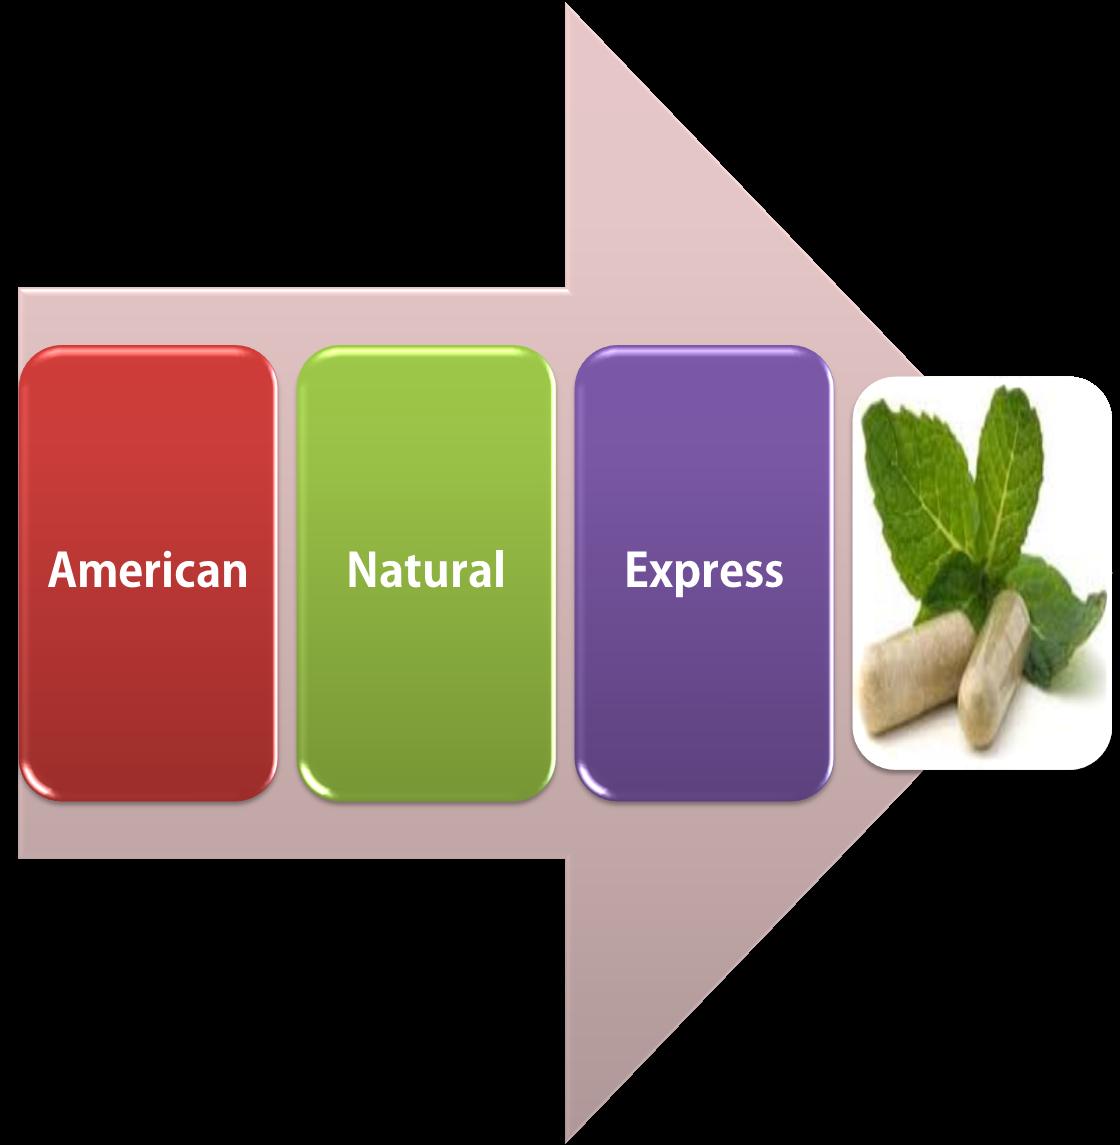 puedo comer lentejas si tengo acido urico verduras prohibidas con acido urico alimentos ricos en vitamina b12 e acido folico